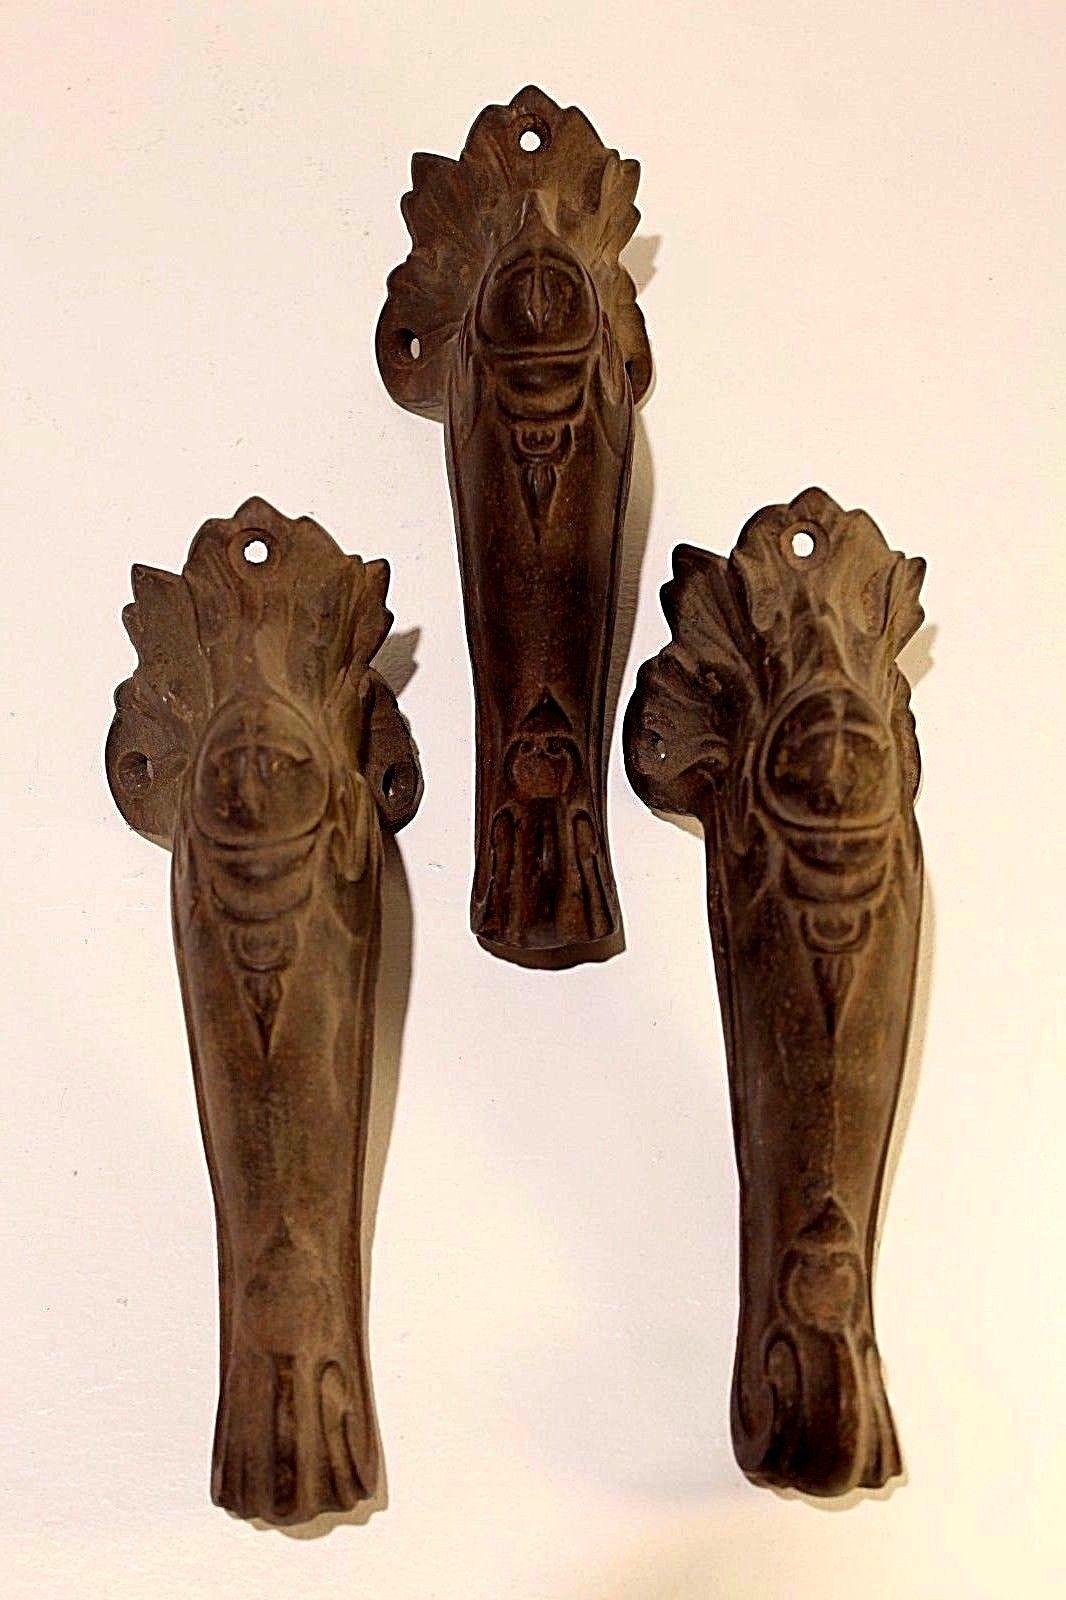 3 Ornate Vintage Victorian Era Cast Iron Clawfoot Tub Feet Bathtub ...